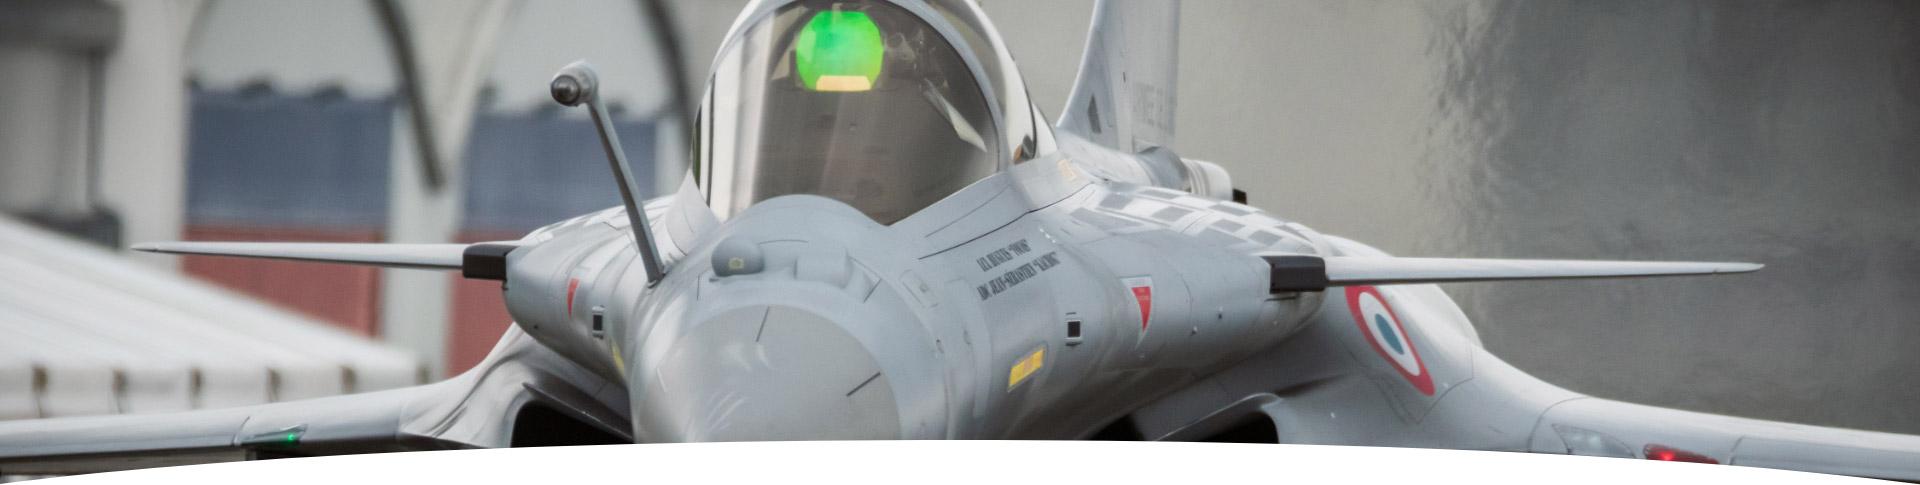 sl-marches-aeronautique